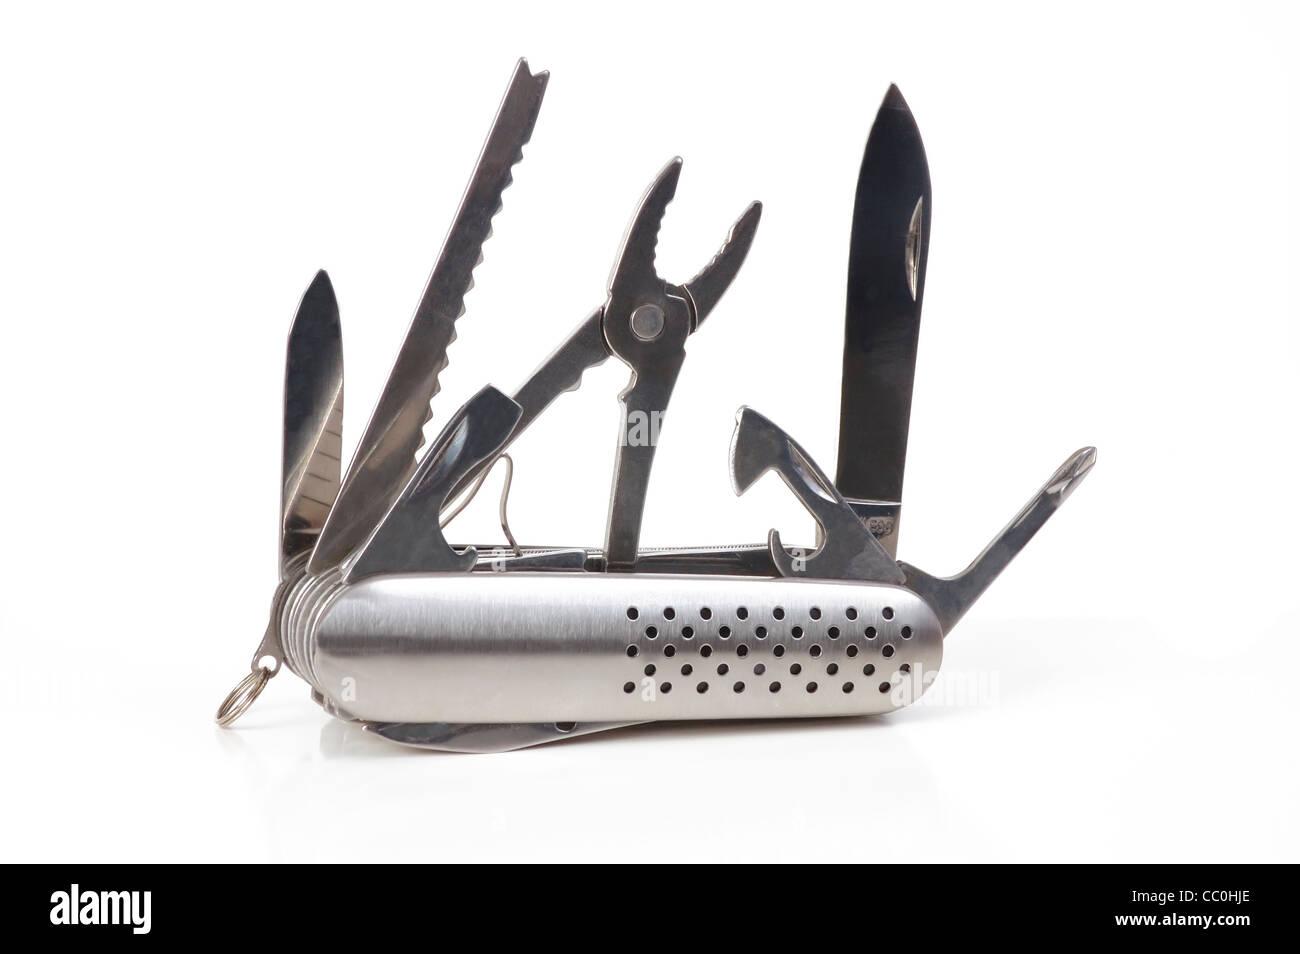 Swiss army knife closeup on white - Stock Image